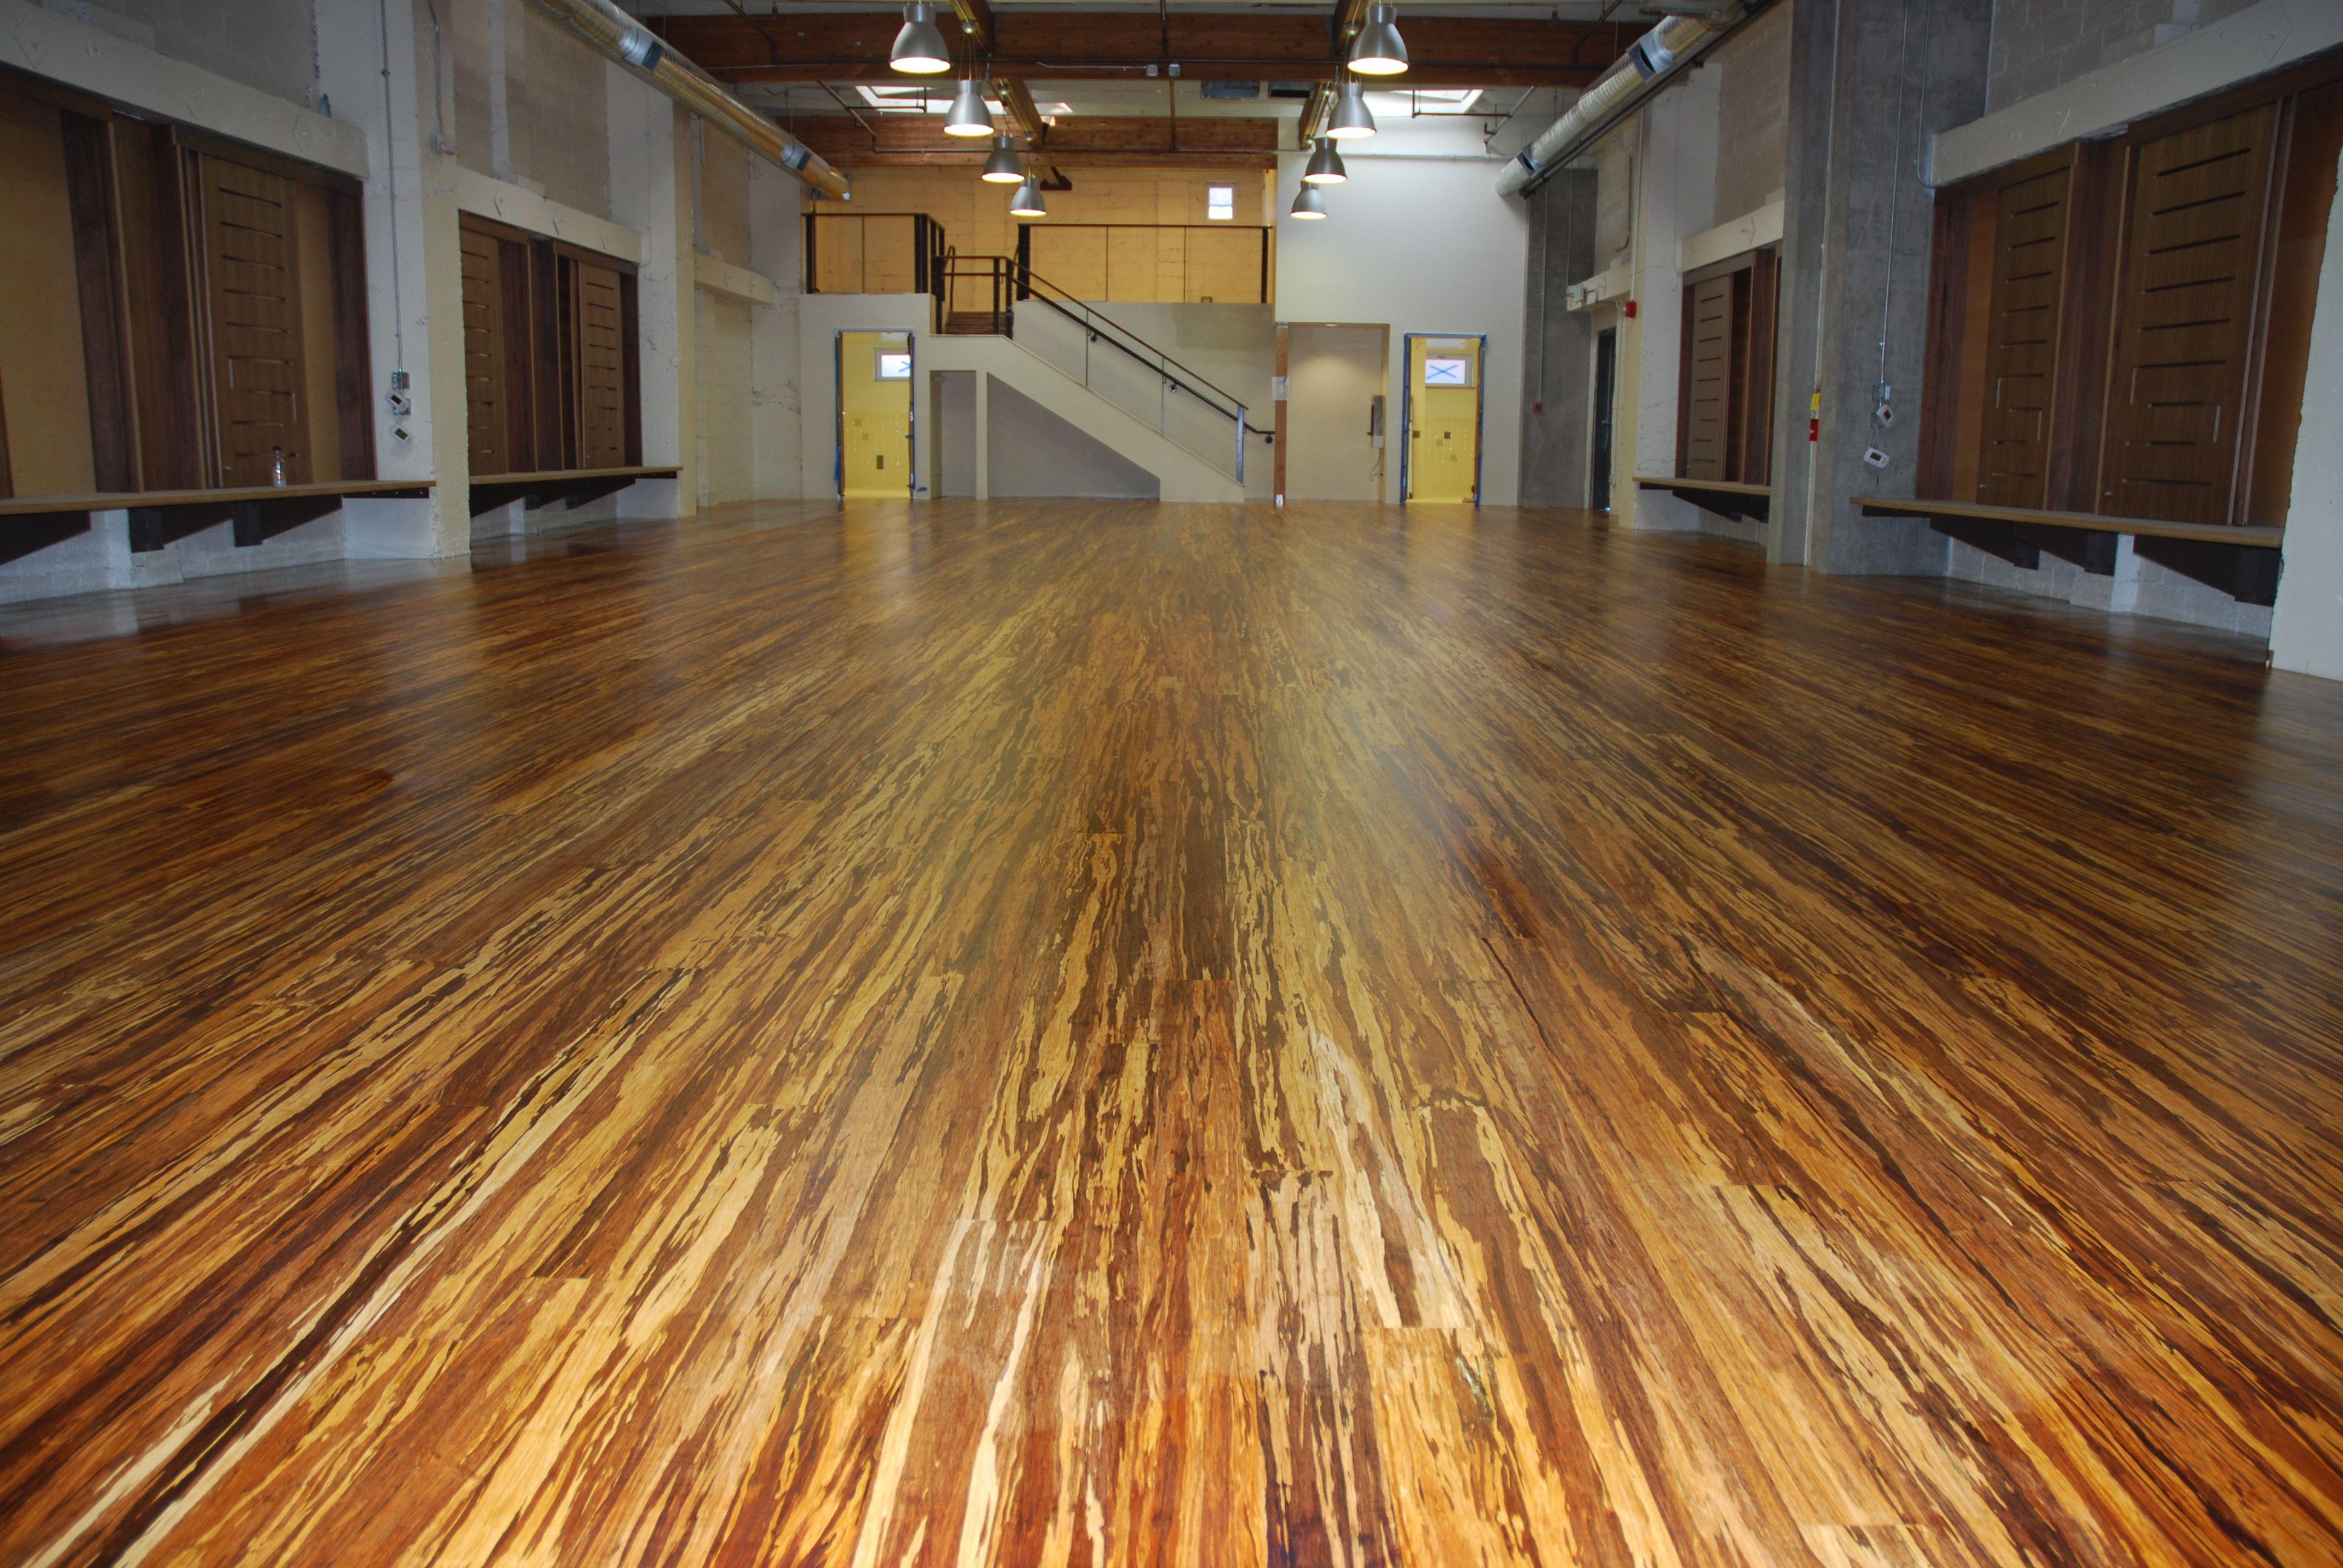 best looking bamboo floors  Google Search  flooring